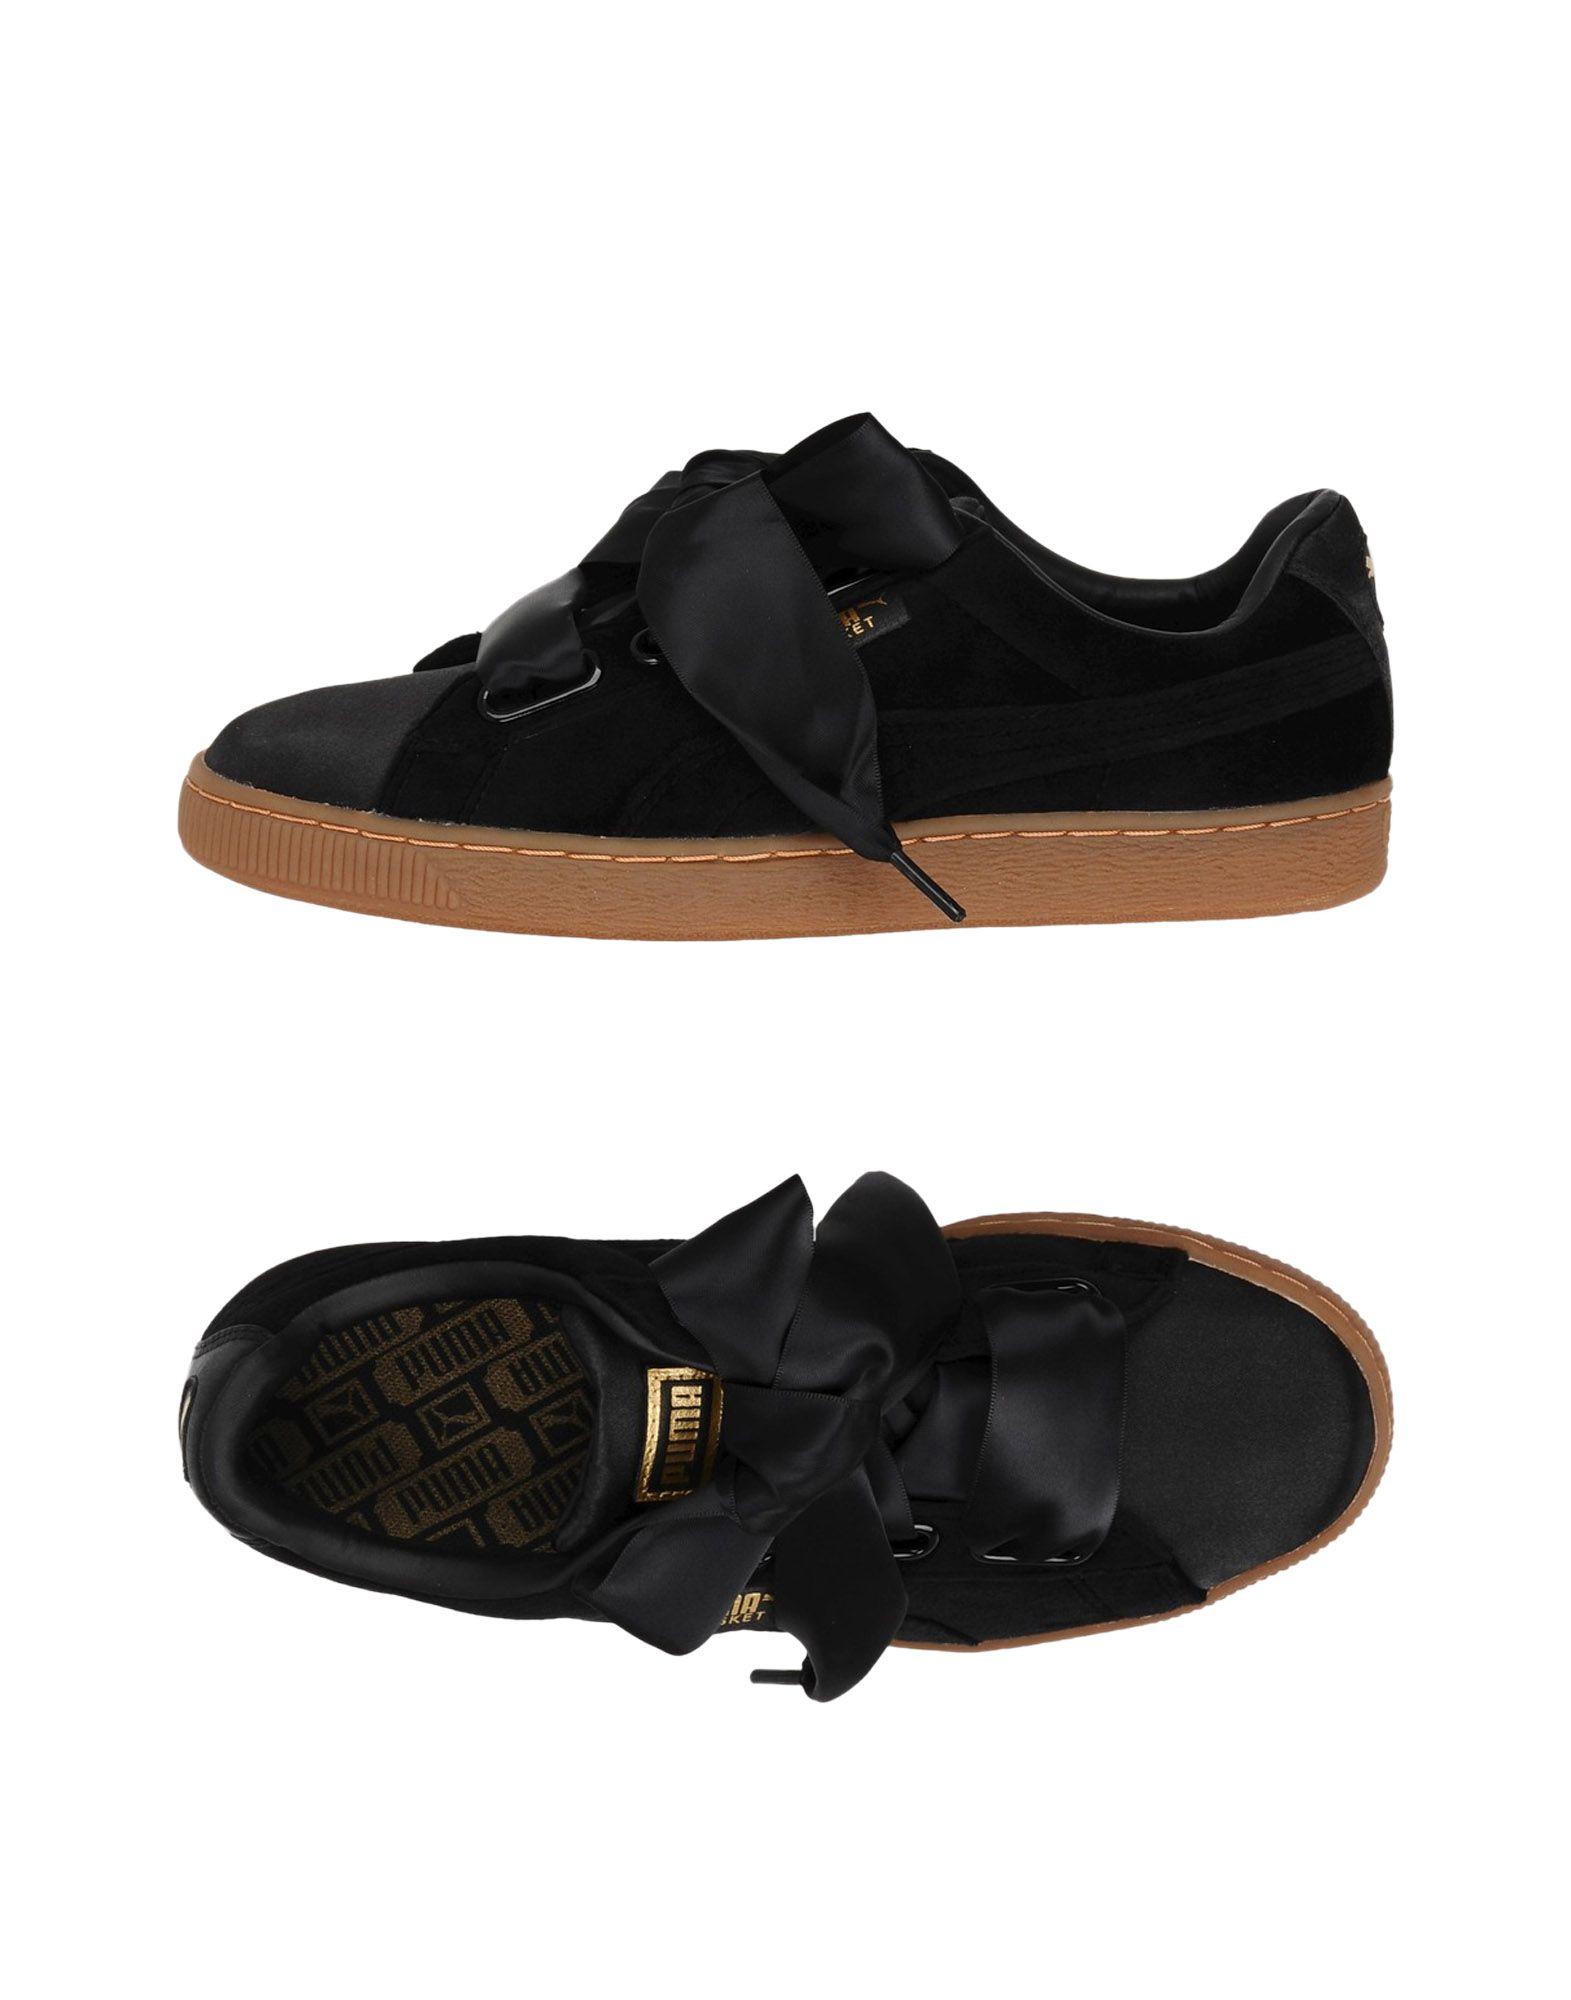 Puma Basket Heart Vs Schuhe Wn's  11445102IK Neue Schuhe Vs c6bae2